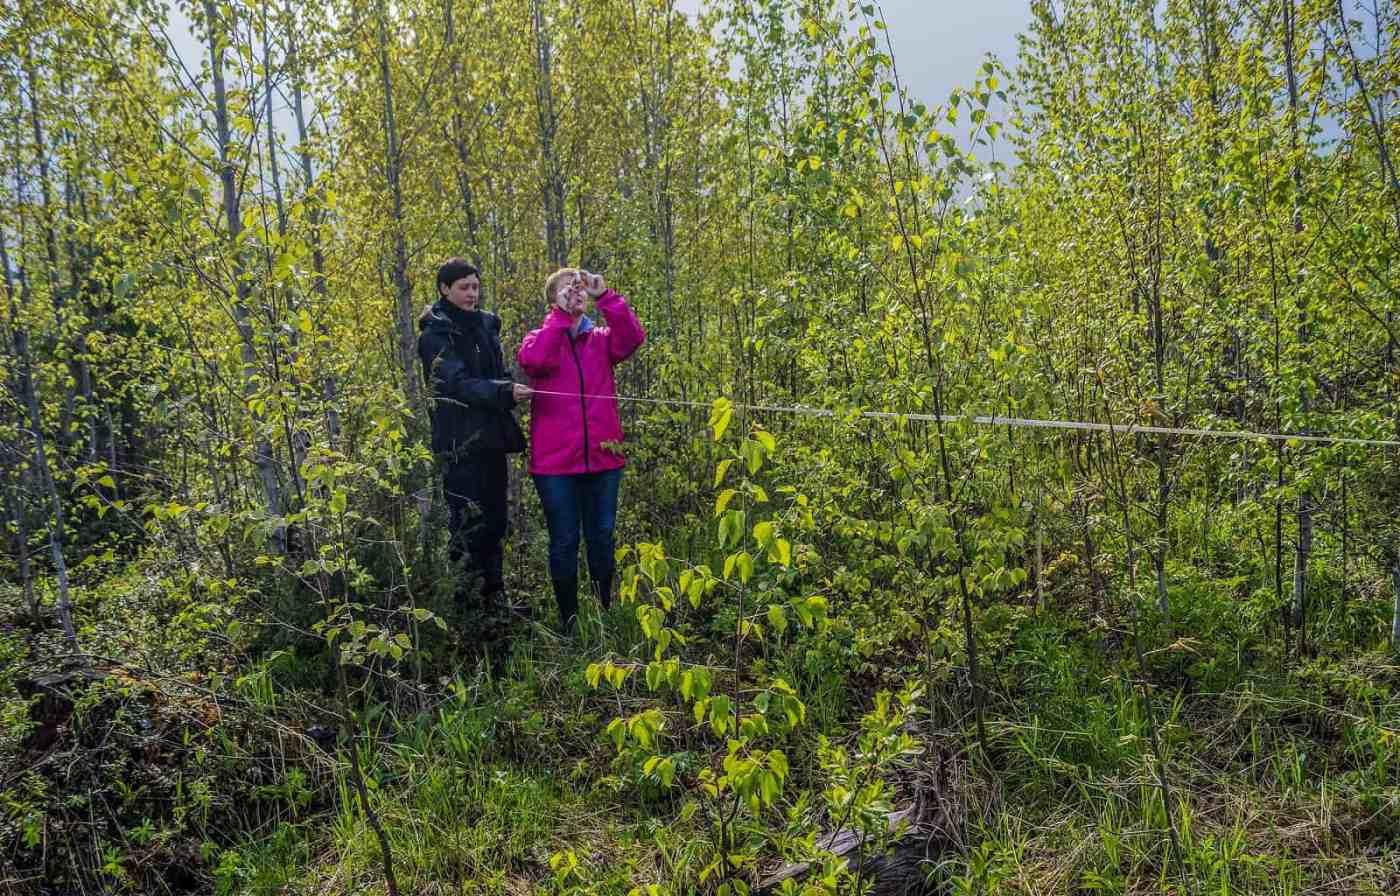 Archangelsk-21885.JPG - © European Wilderness Society CC BY-NC-ND 4.0